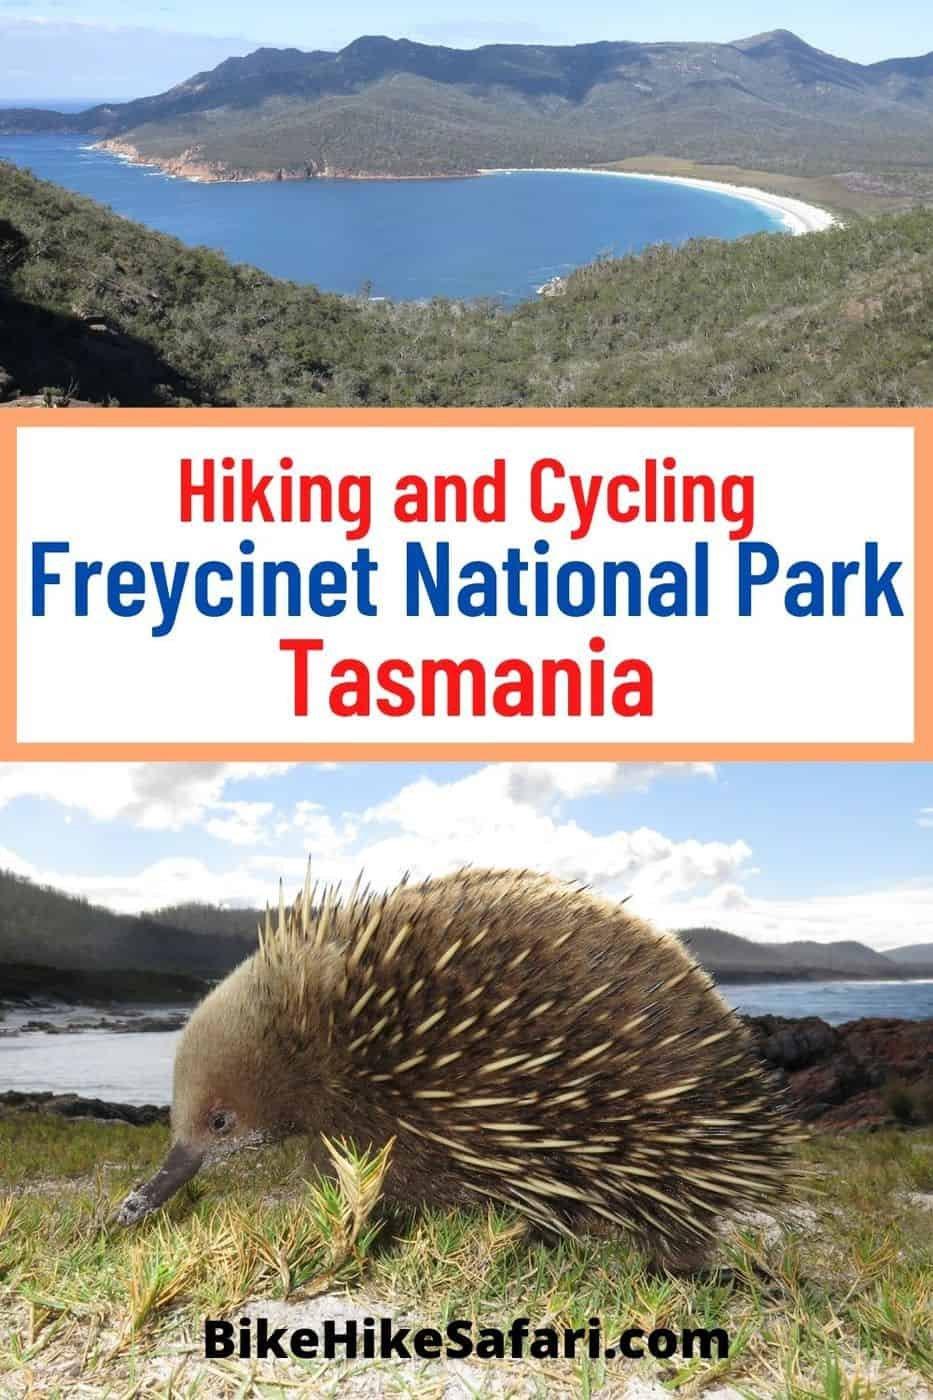 Hiking and Cycling Freycinet National Park Tasmania